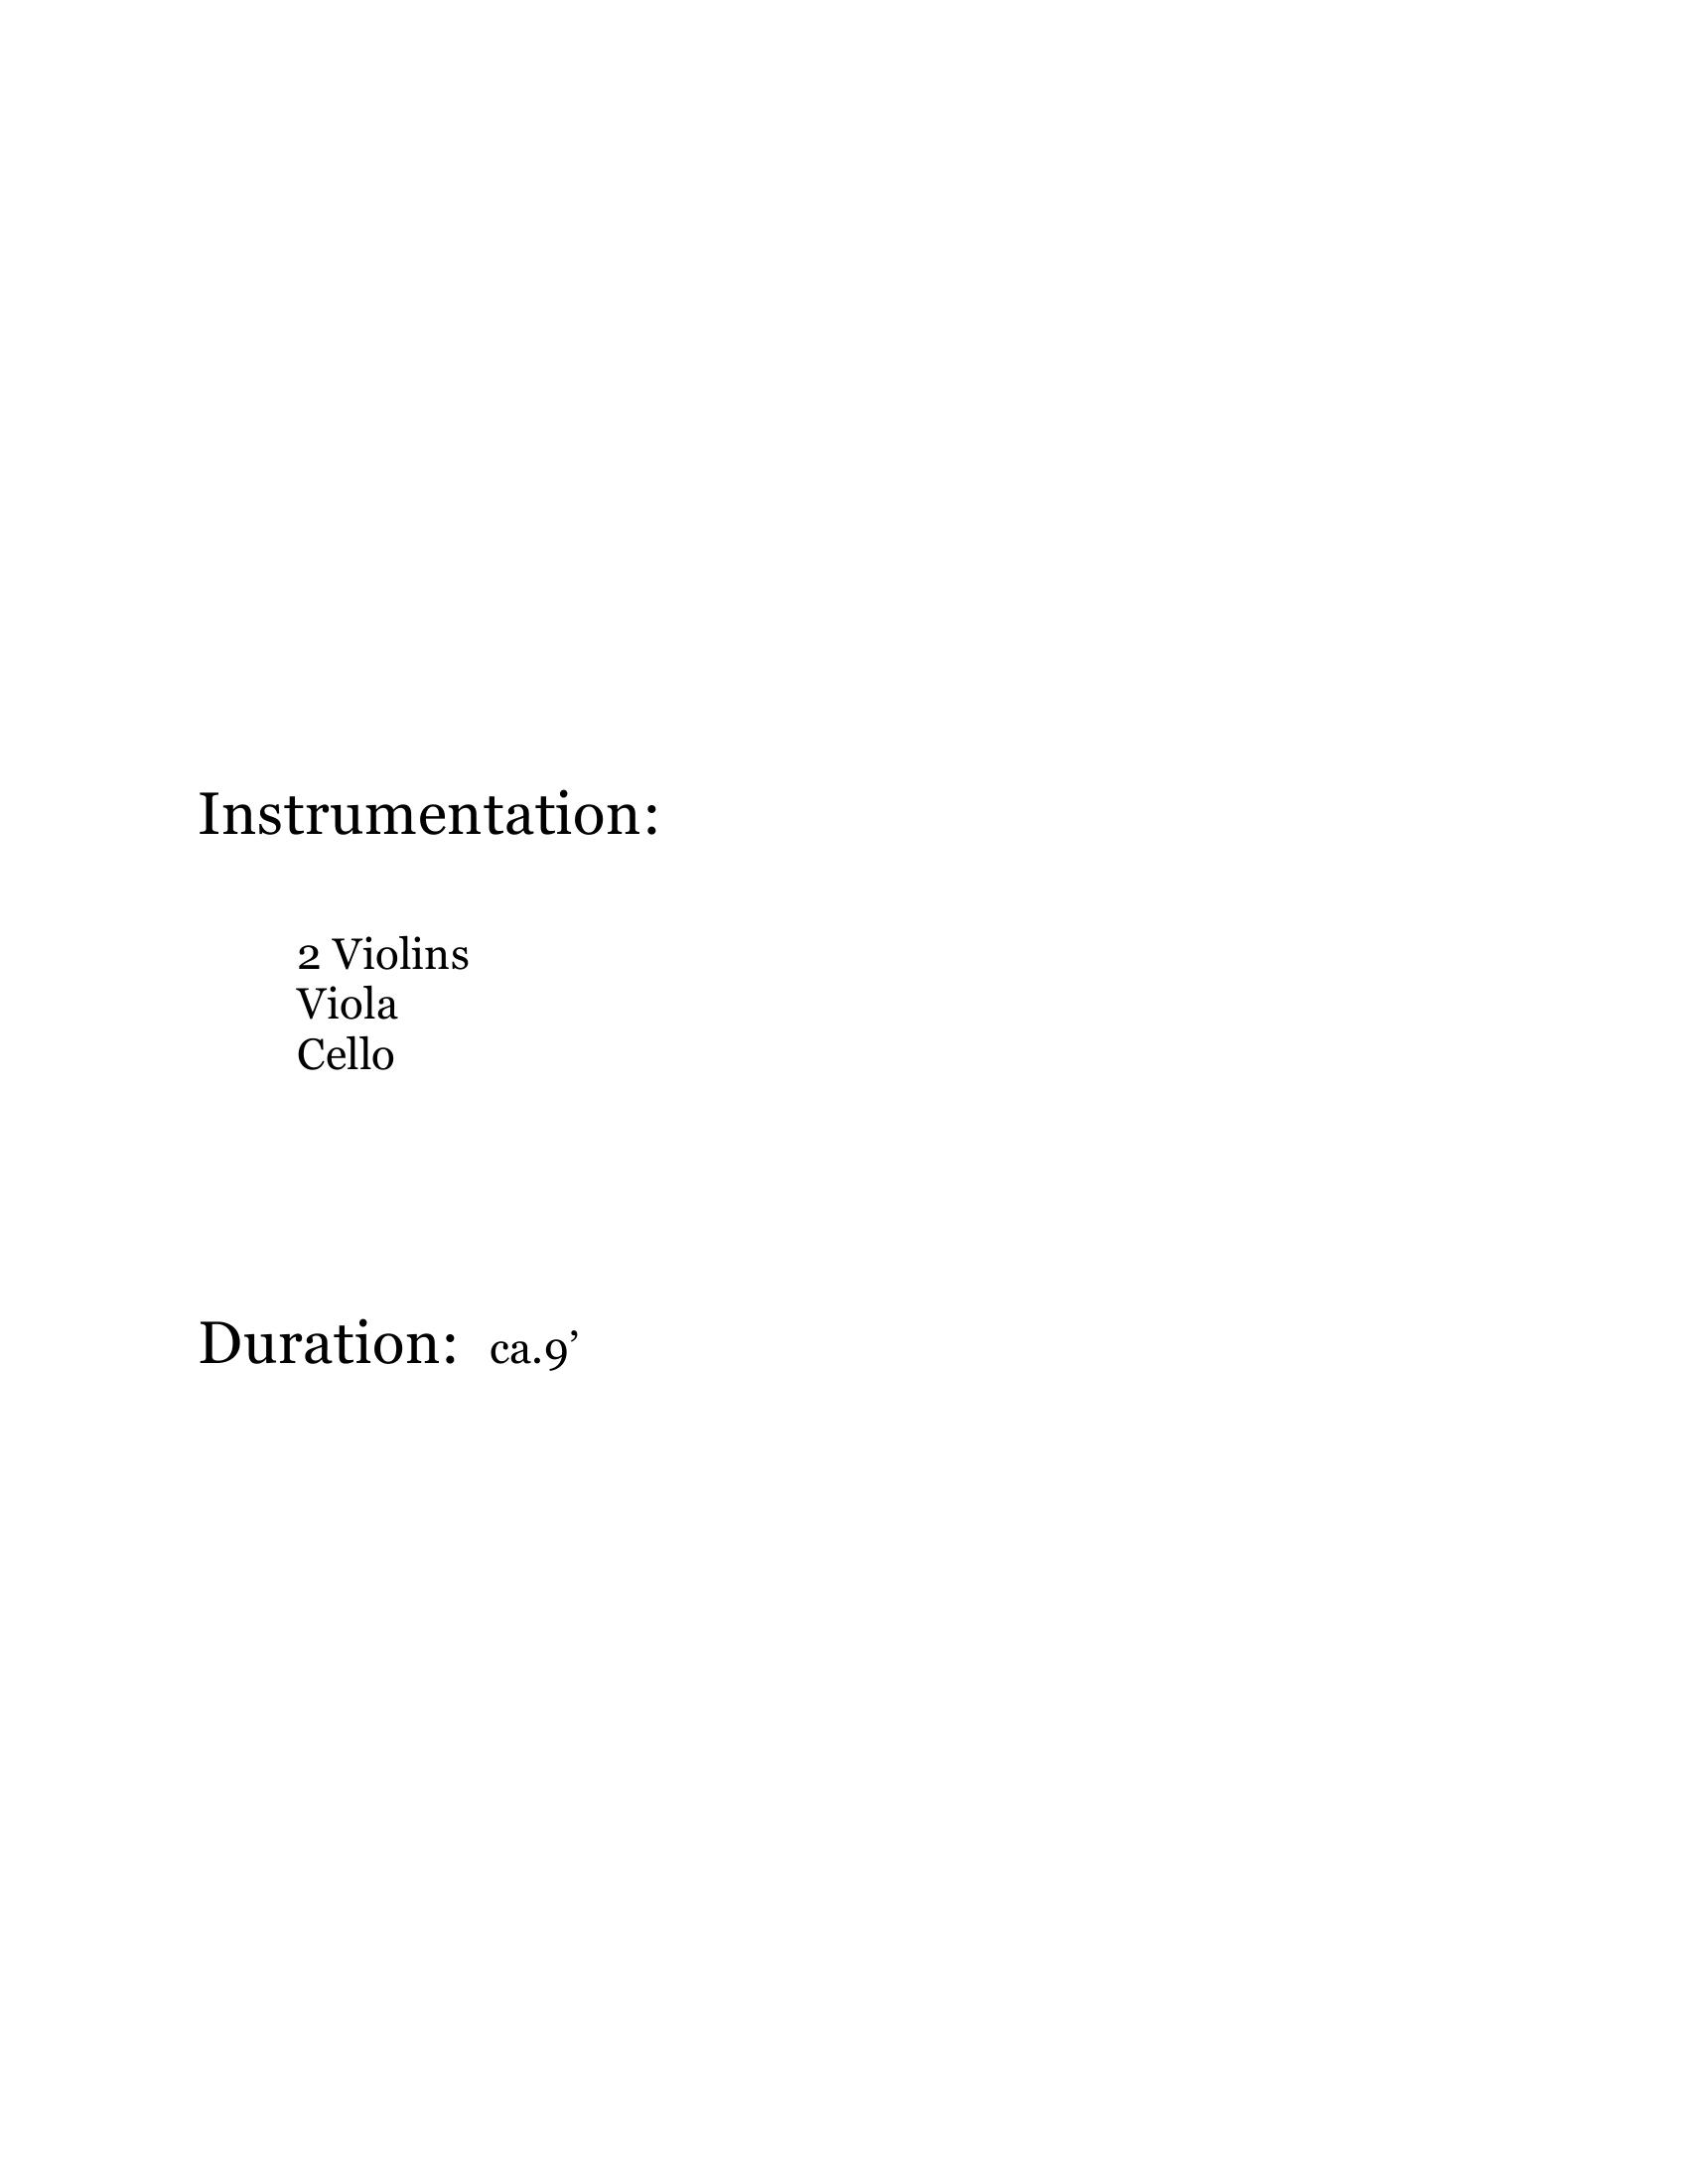 Hymn - String Quartet Version - Digital Score and Parts — Geoff Knorr